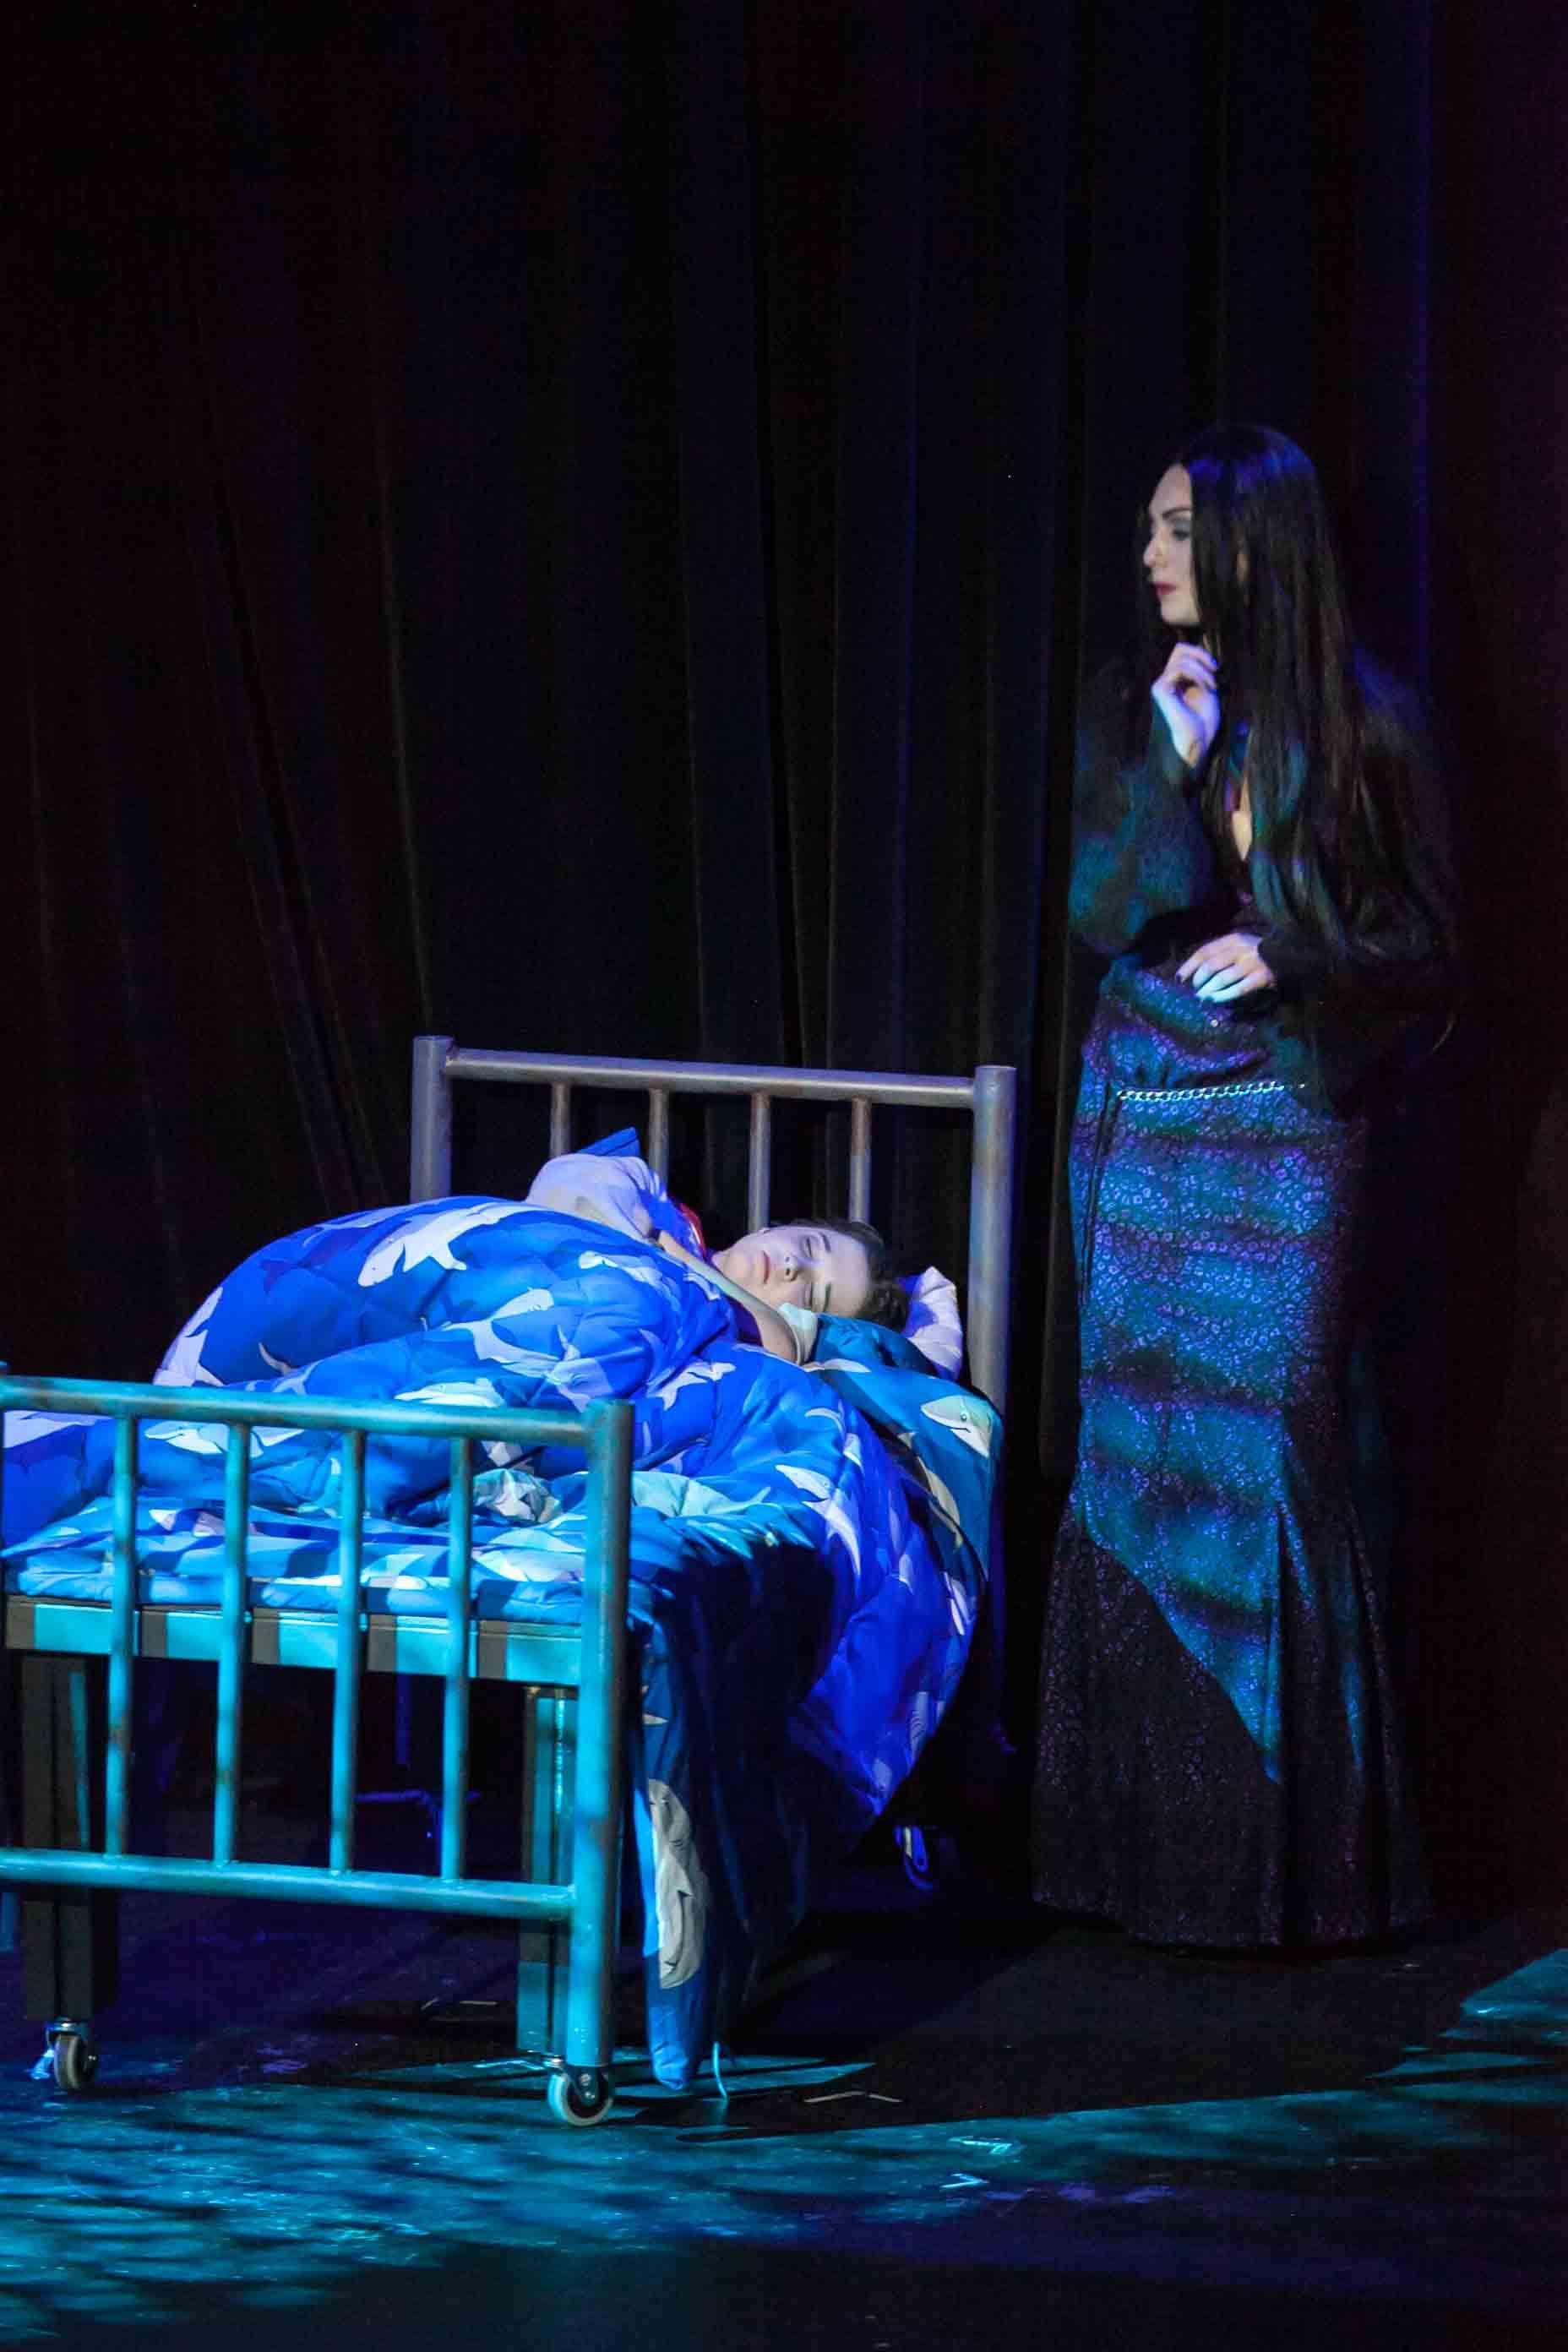 6-19-16 Addams Family Kooky Cast 0361.jpg